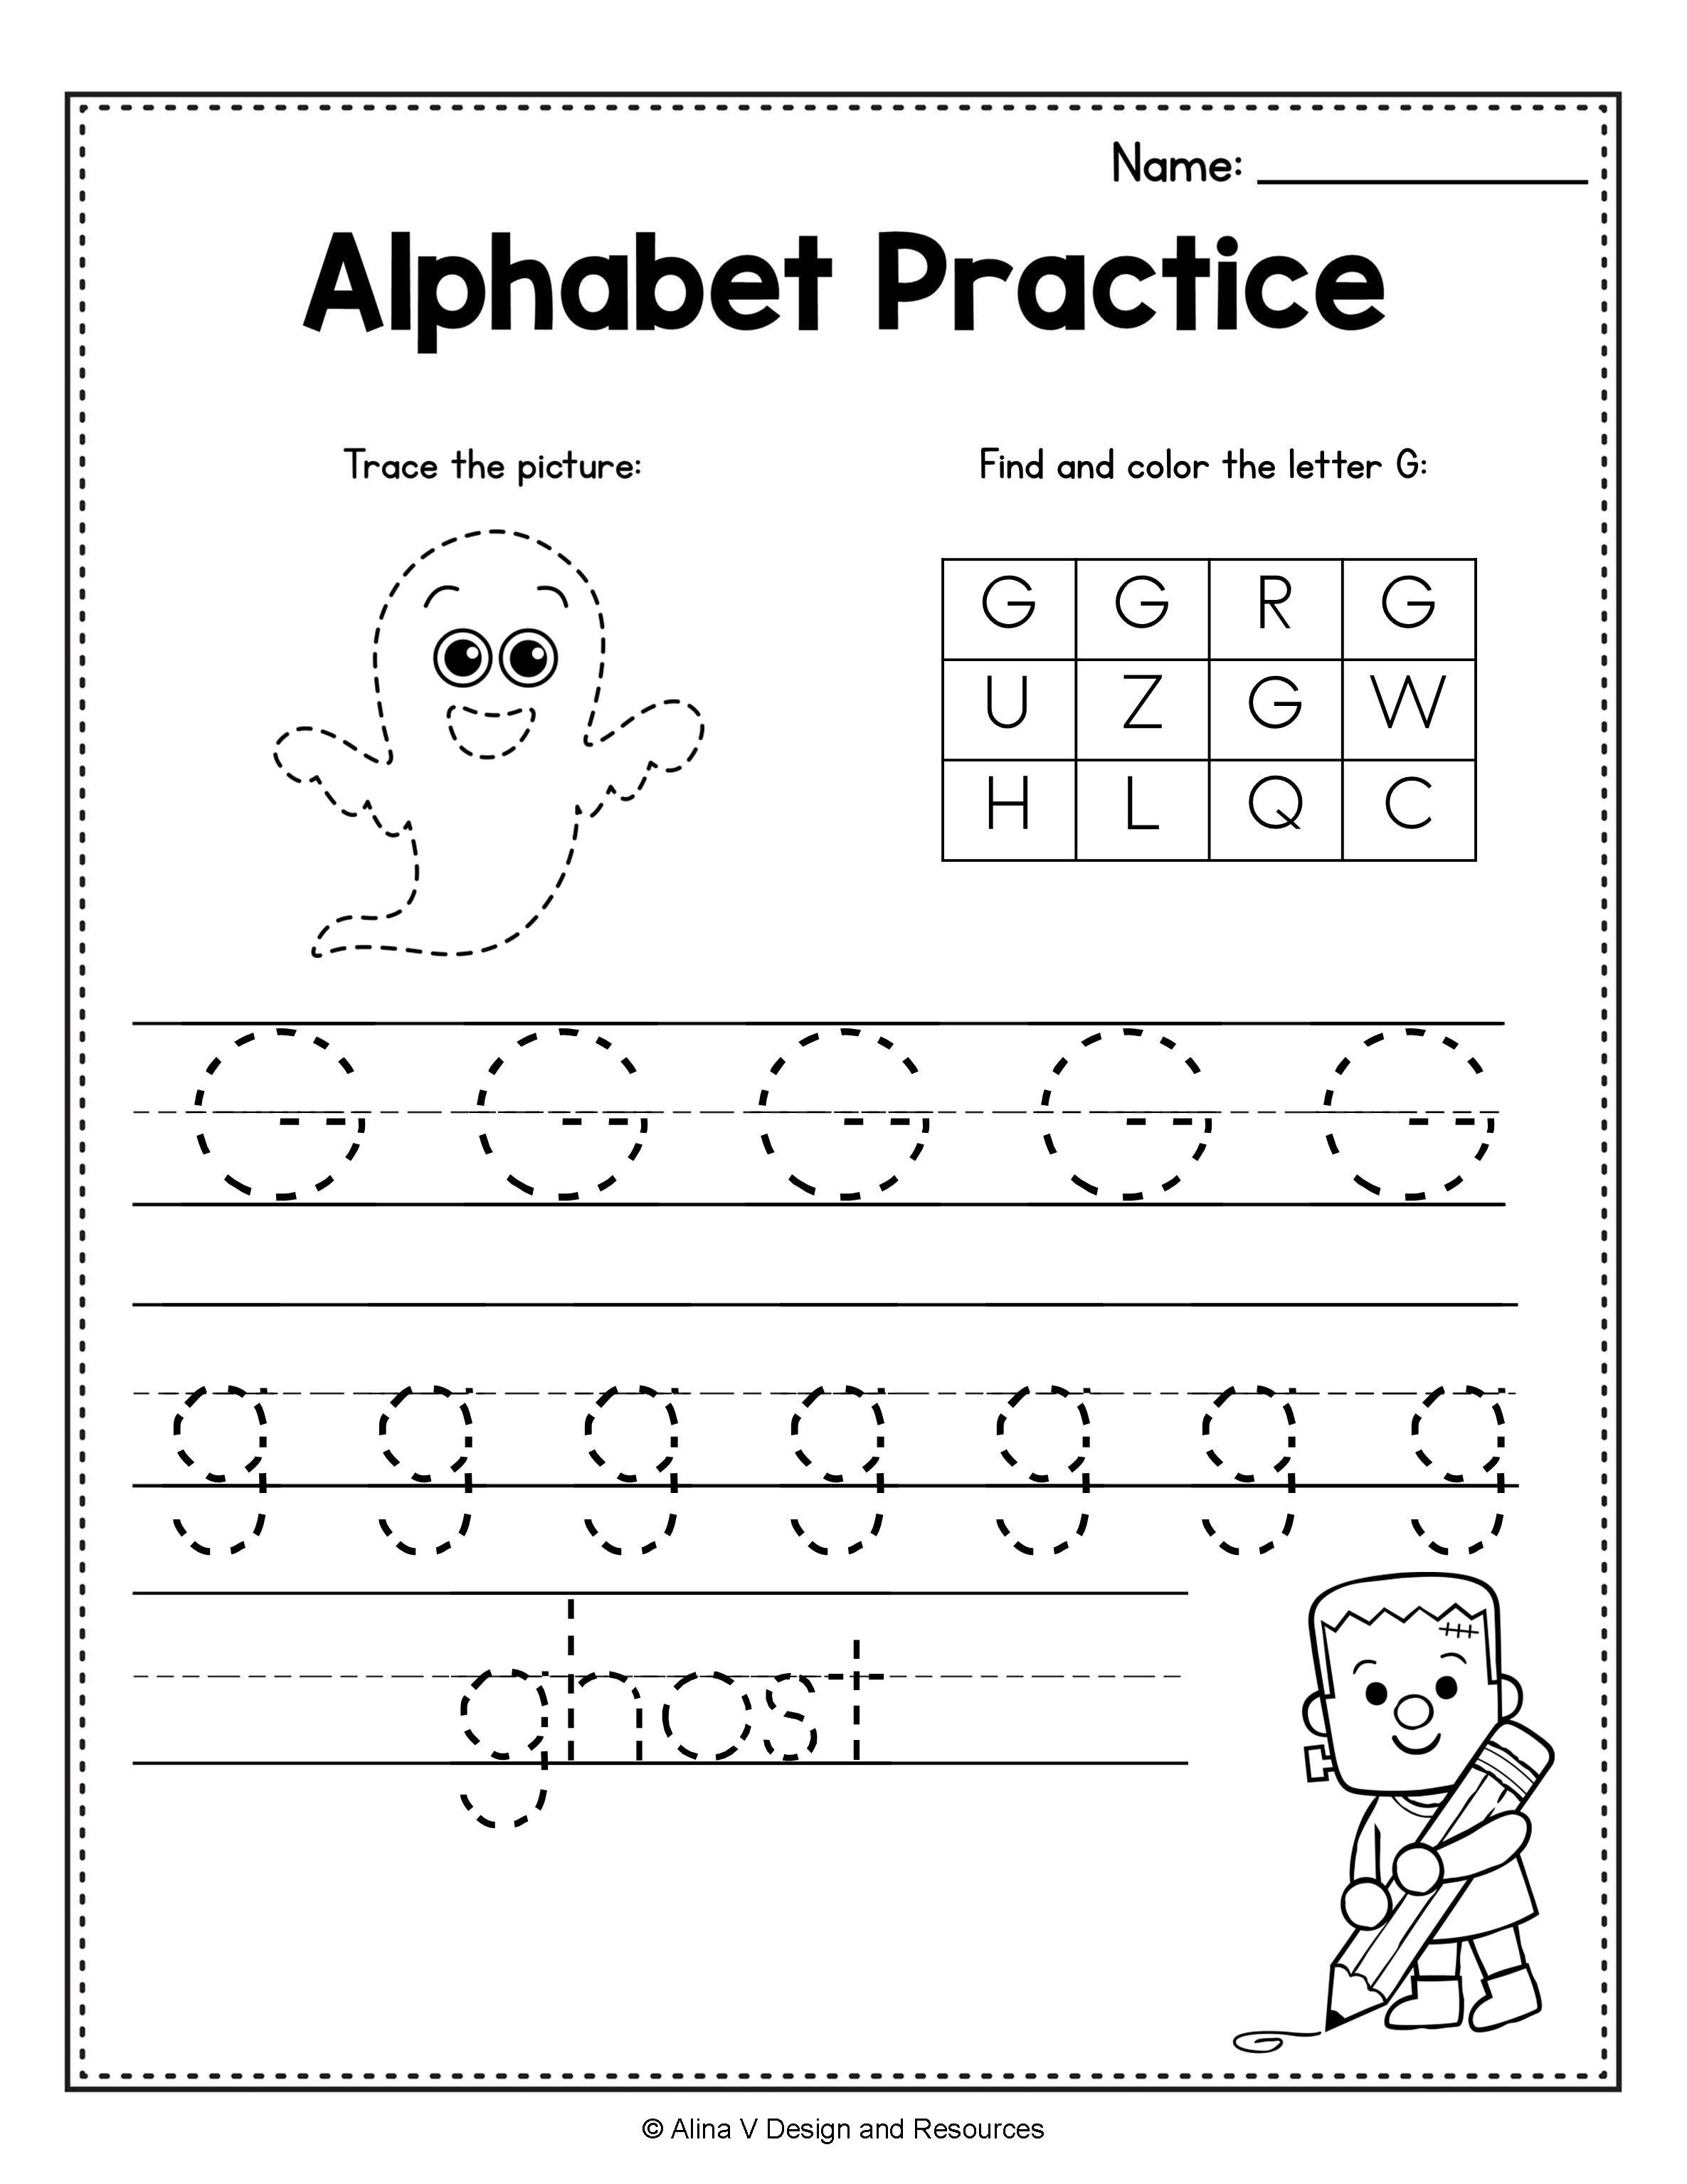 Letter G Worksheet Free Worksheets For Preschool And Kindergarten In 2020 Alphabet Writing Practice Preschool Worksheets Writing Practice